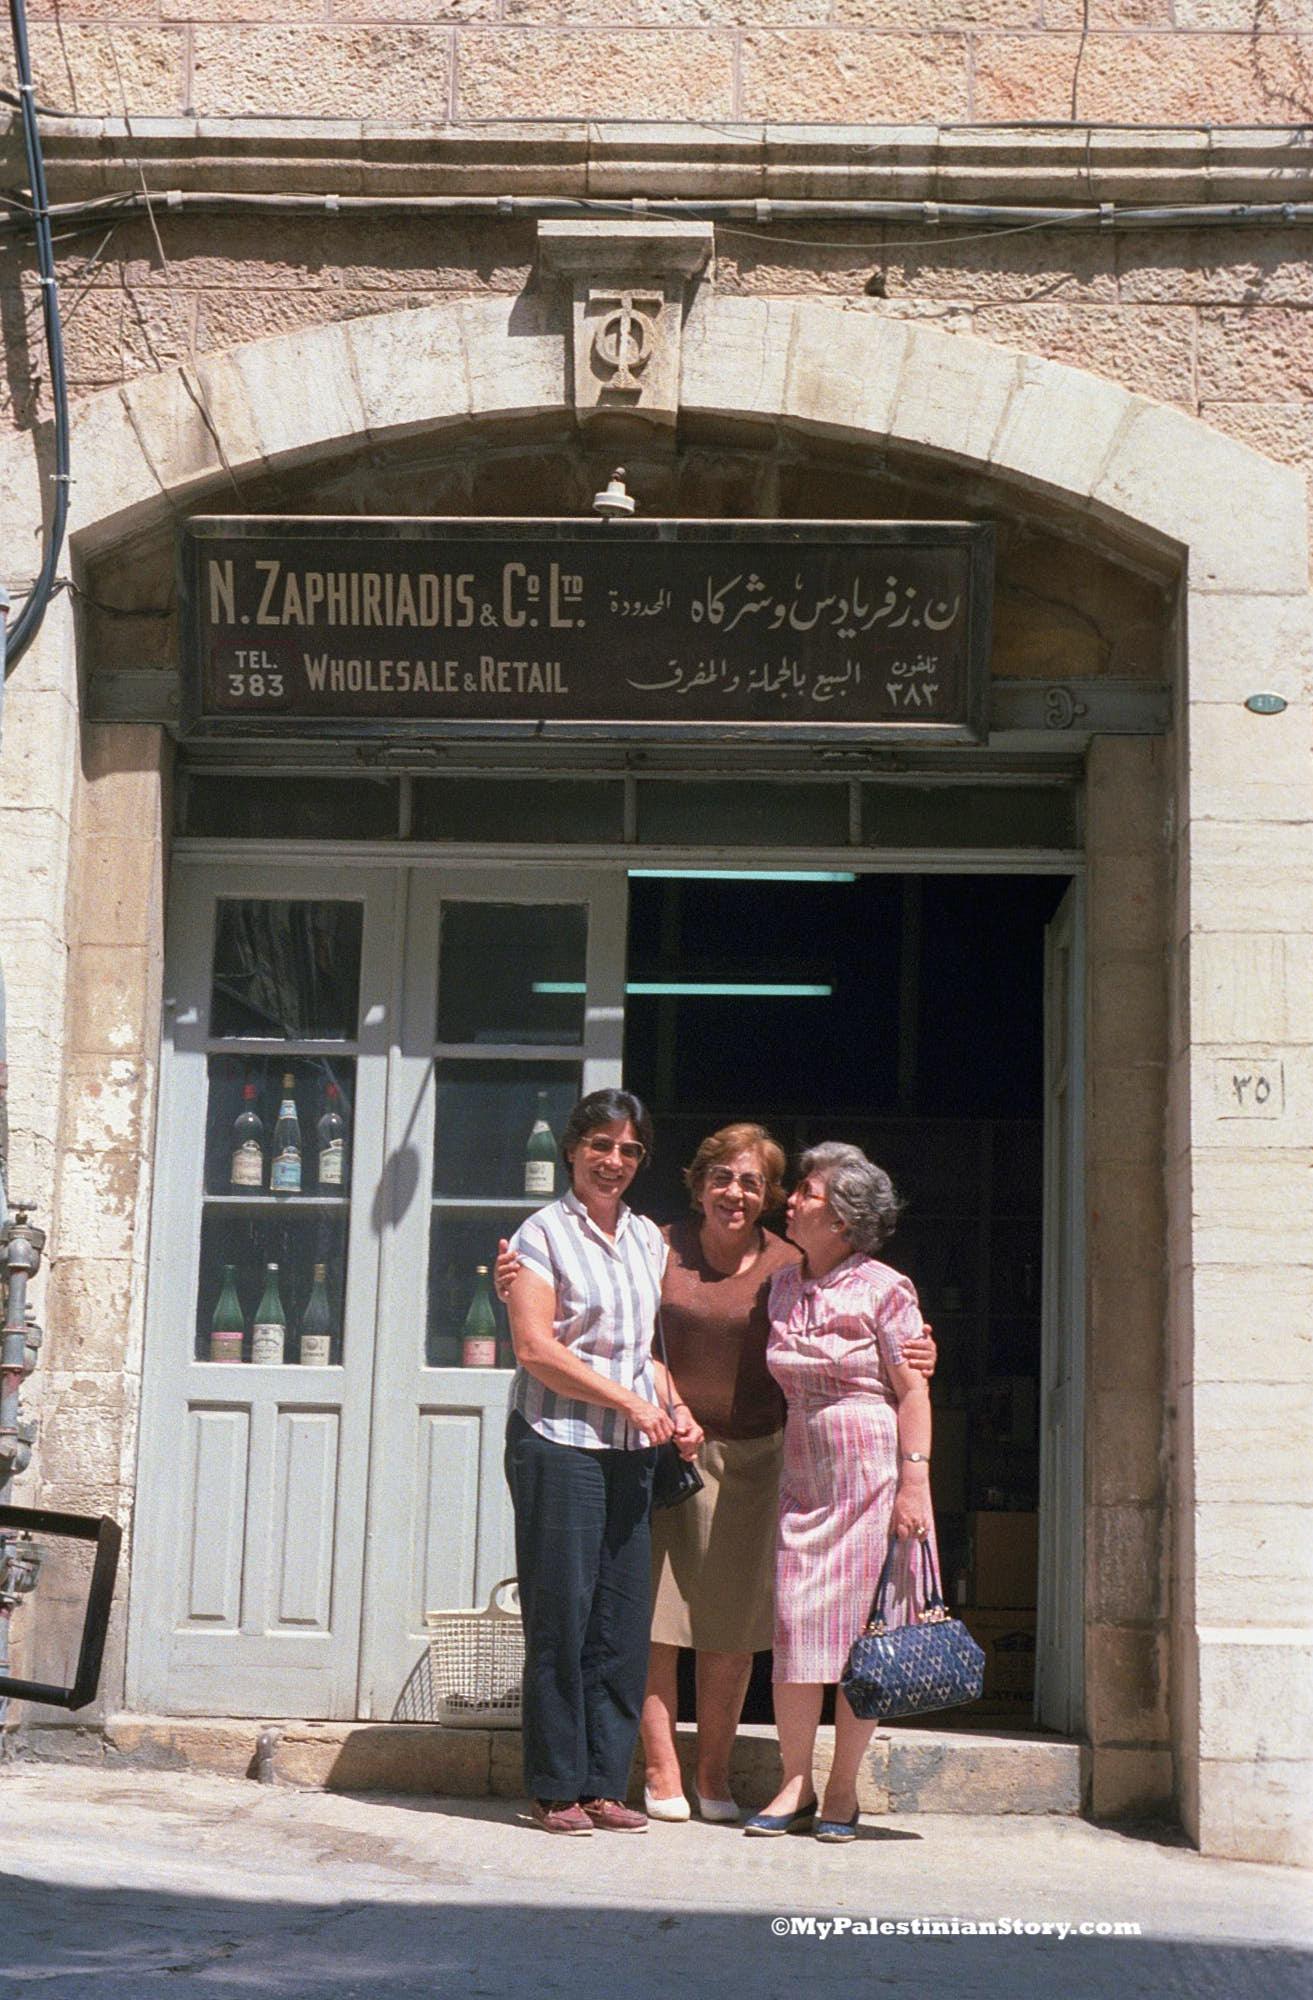 Marianna Spyridon, Ioanna Zaphiriadis and Anna Kassotou in Jerusalem - Aug 1986